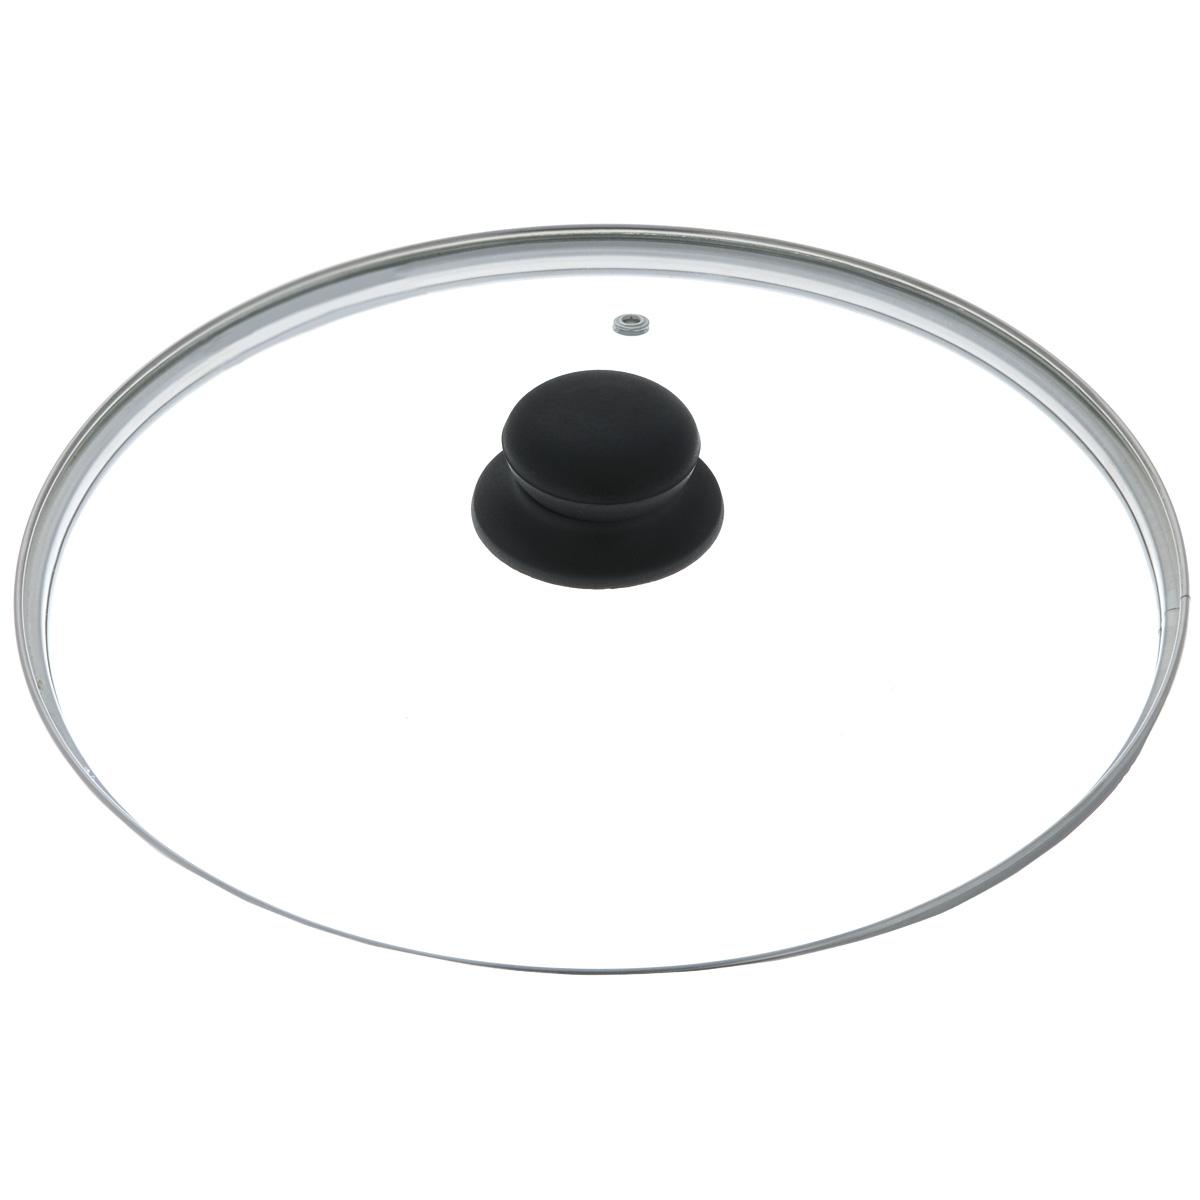 Крышка стеклянная, диаметр 28 см крышка 28 см eley крышка 28 см